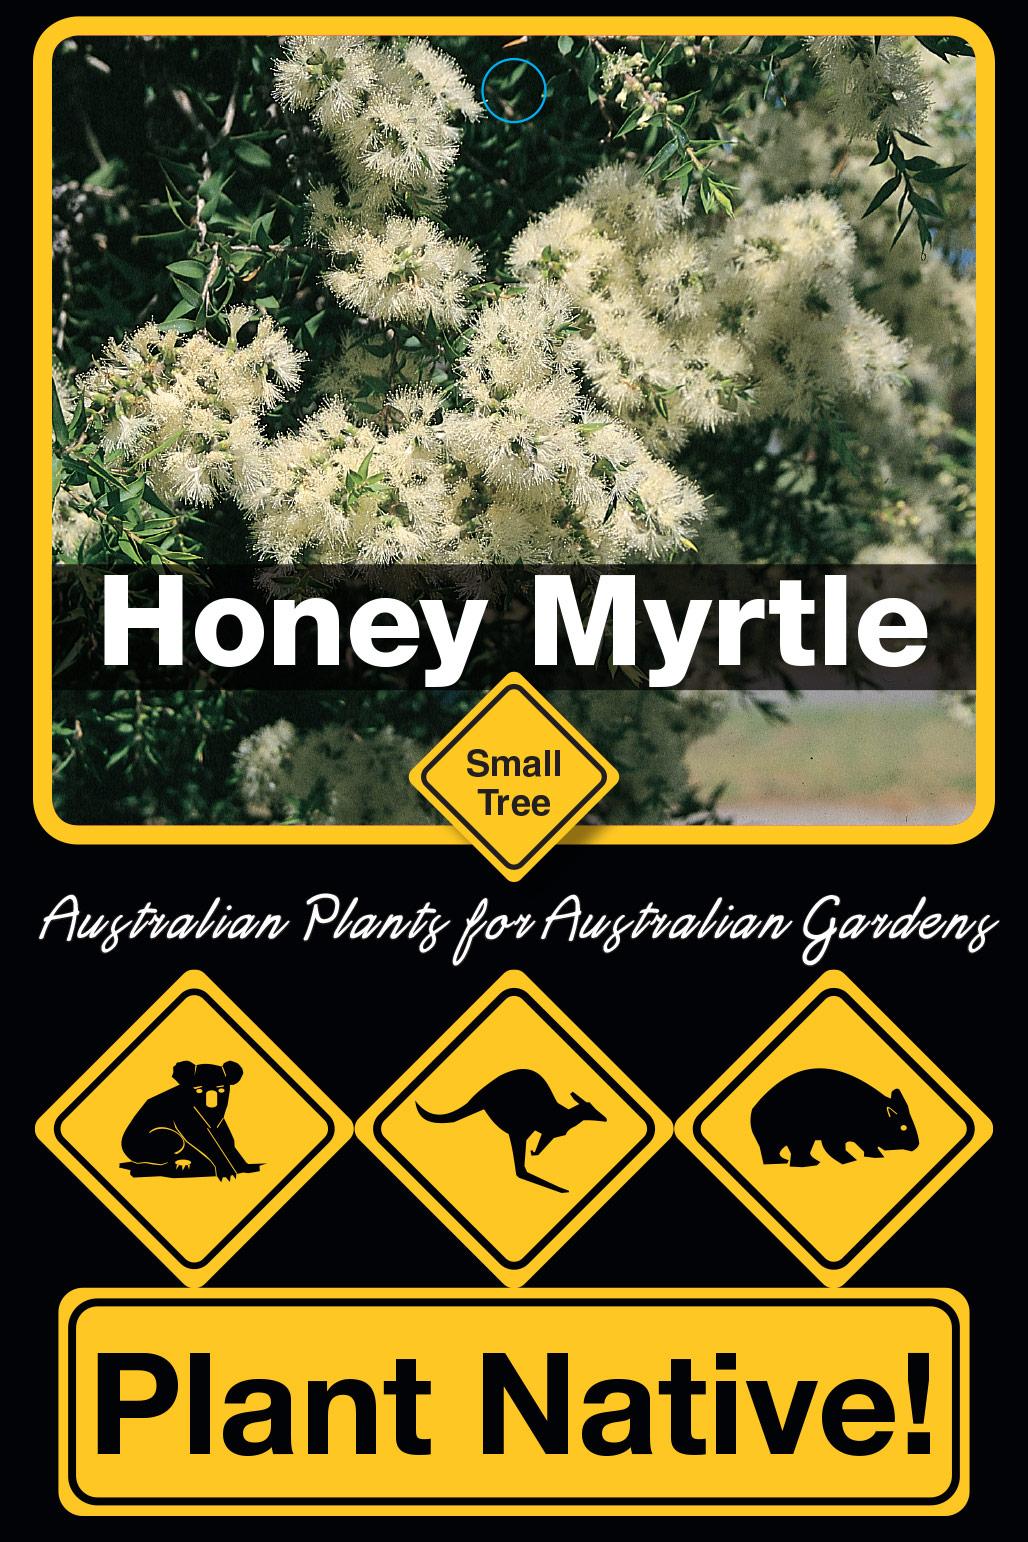 Honey Myrtle - Plant Native!